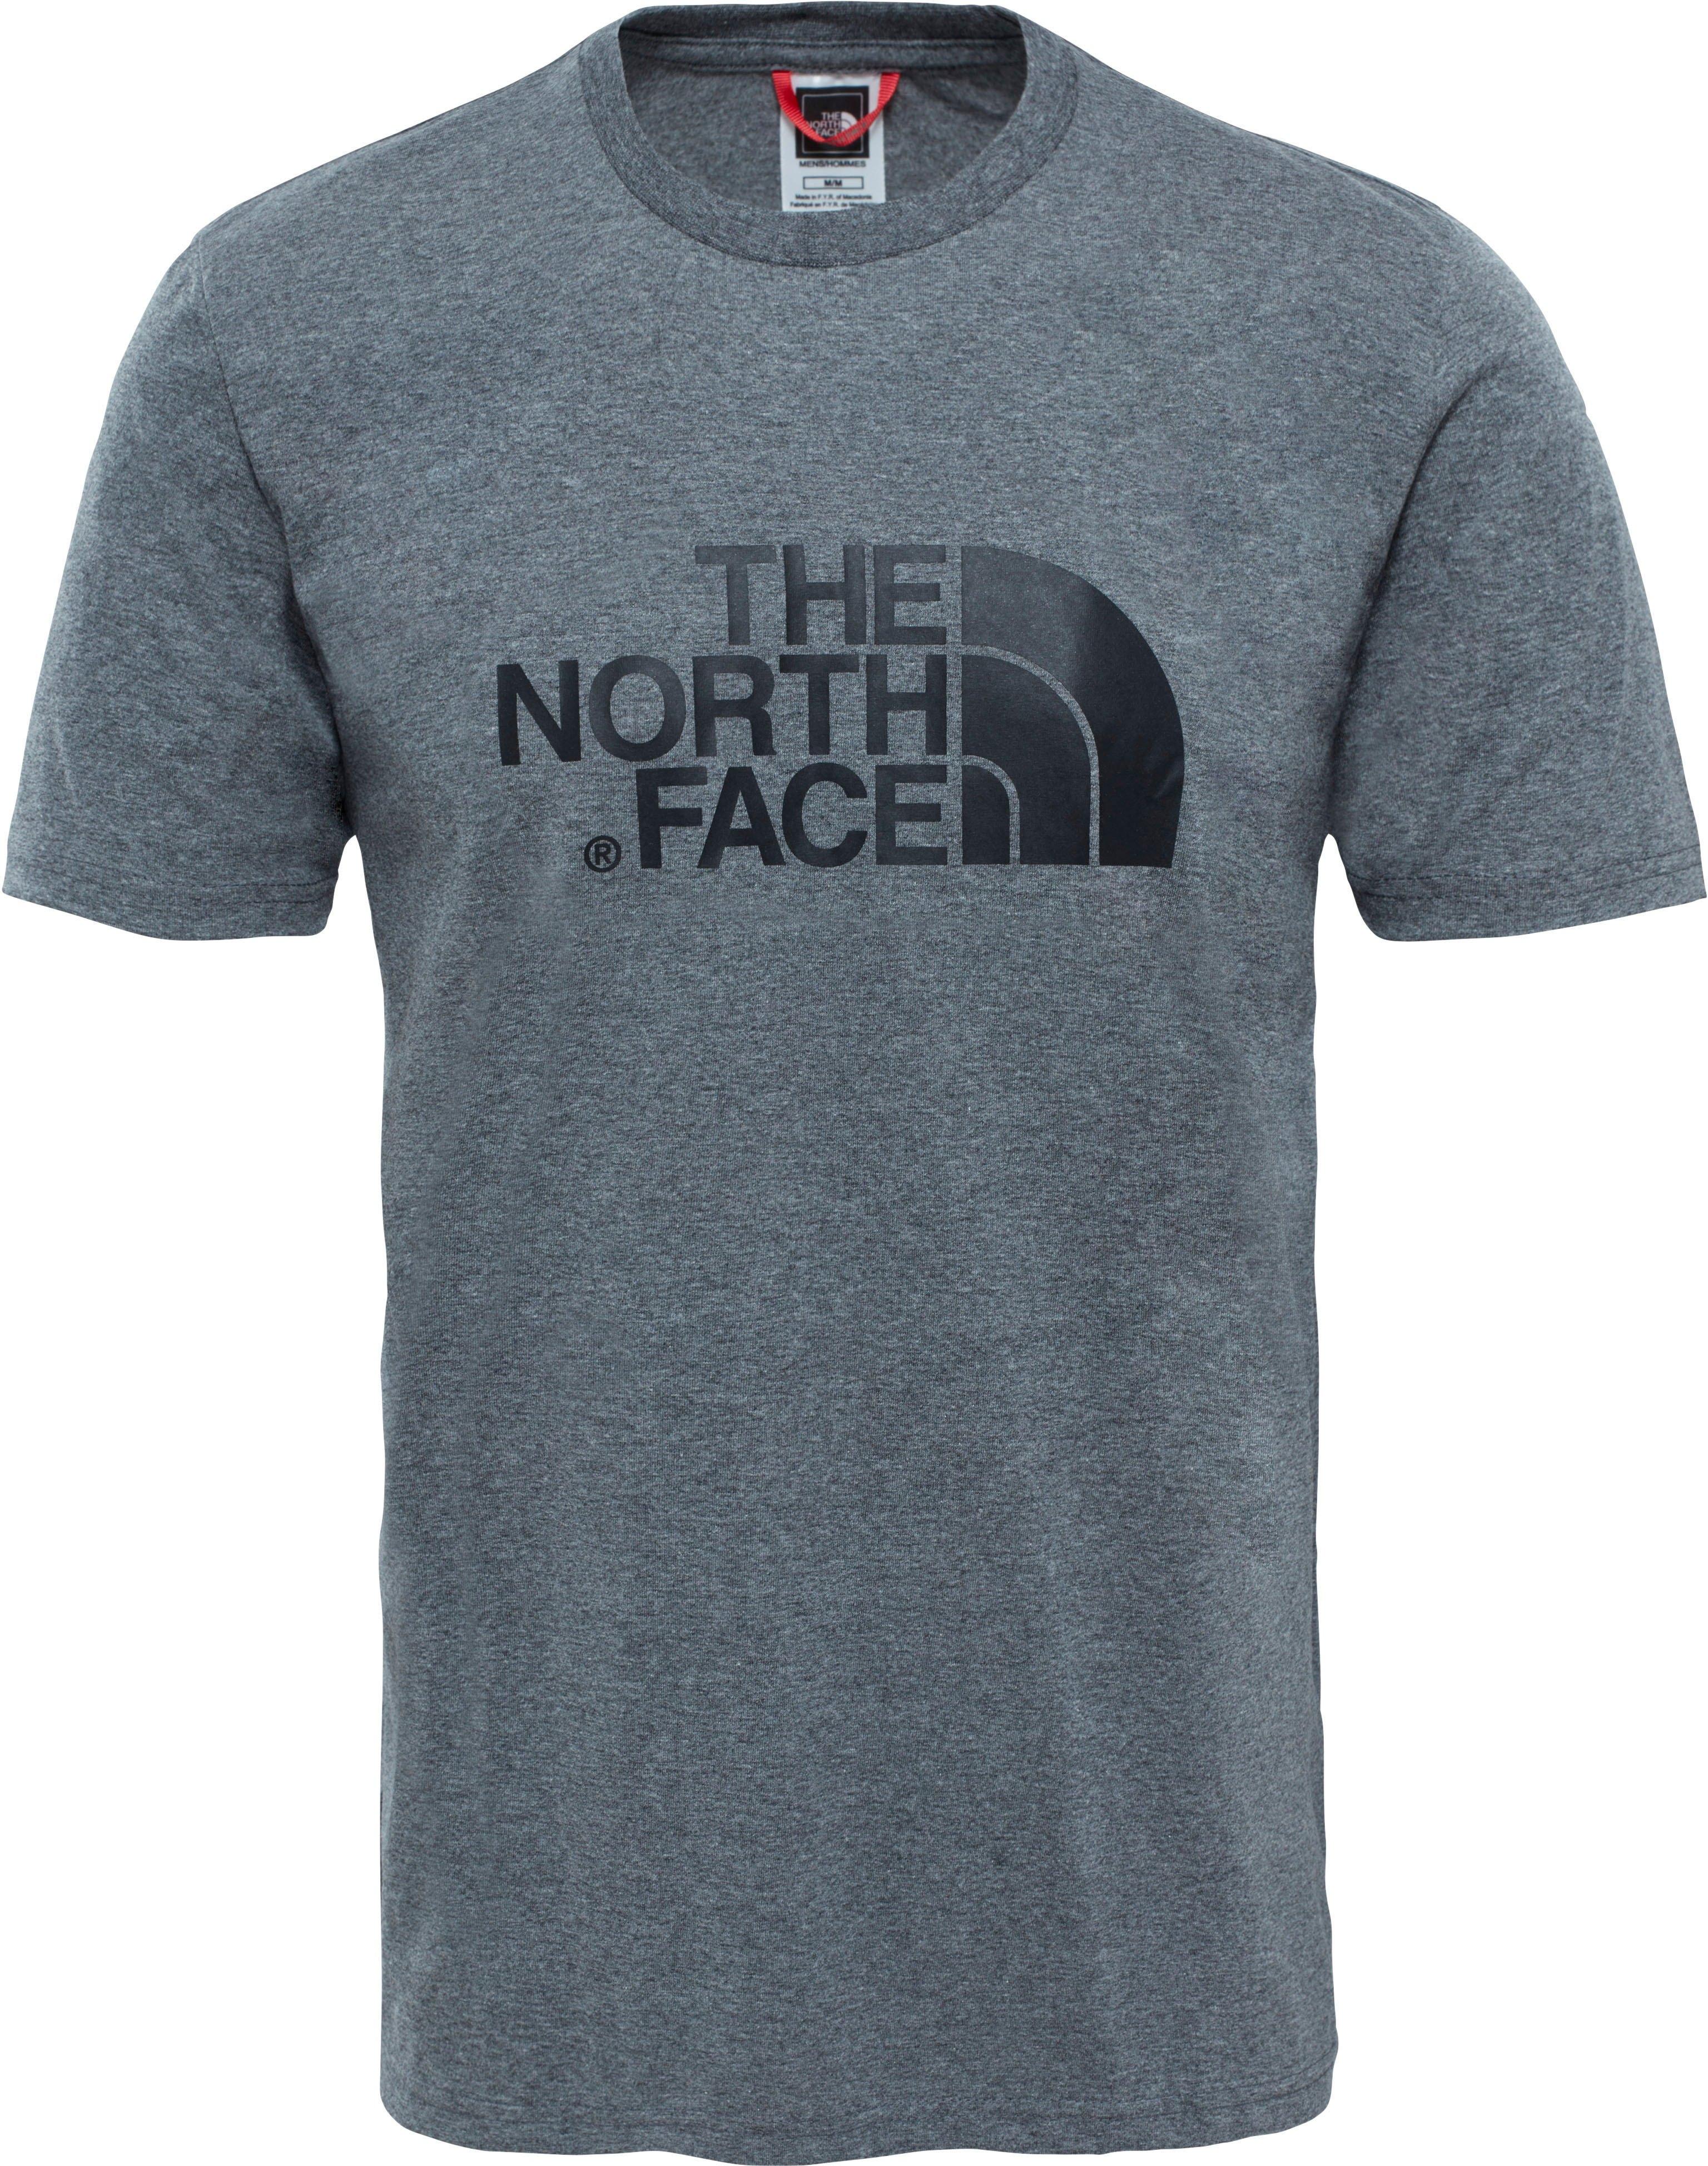 The North Face T-shirt EASY TEE Grote logoprint voordelig en veilig online kopen